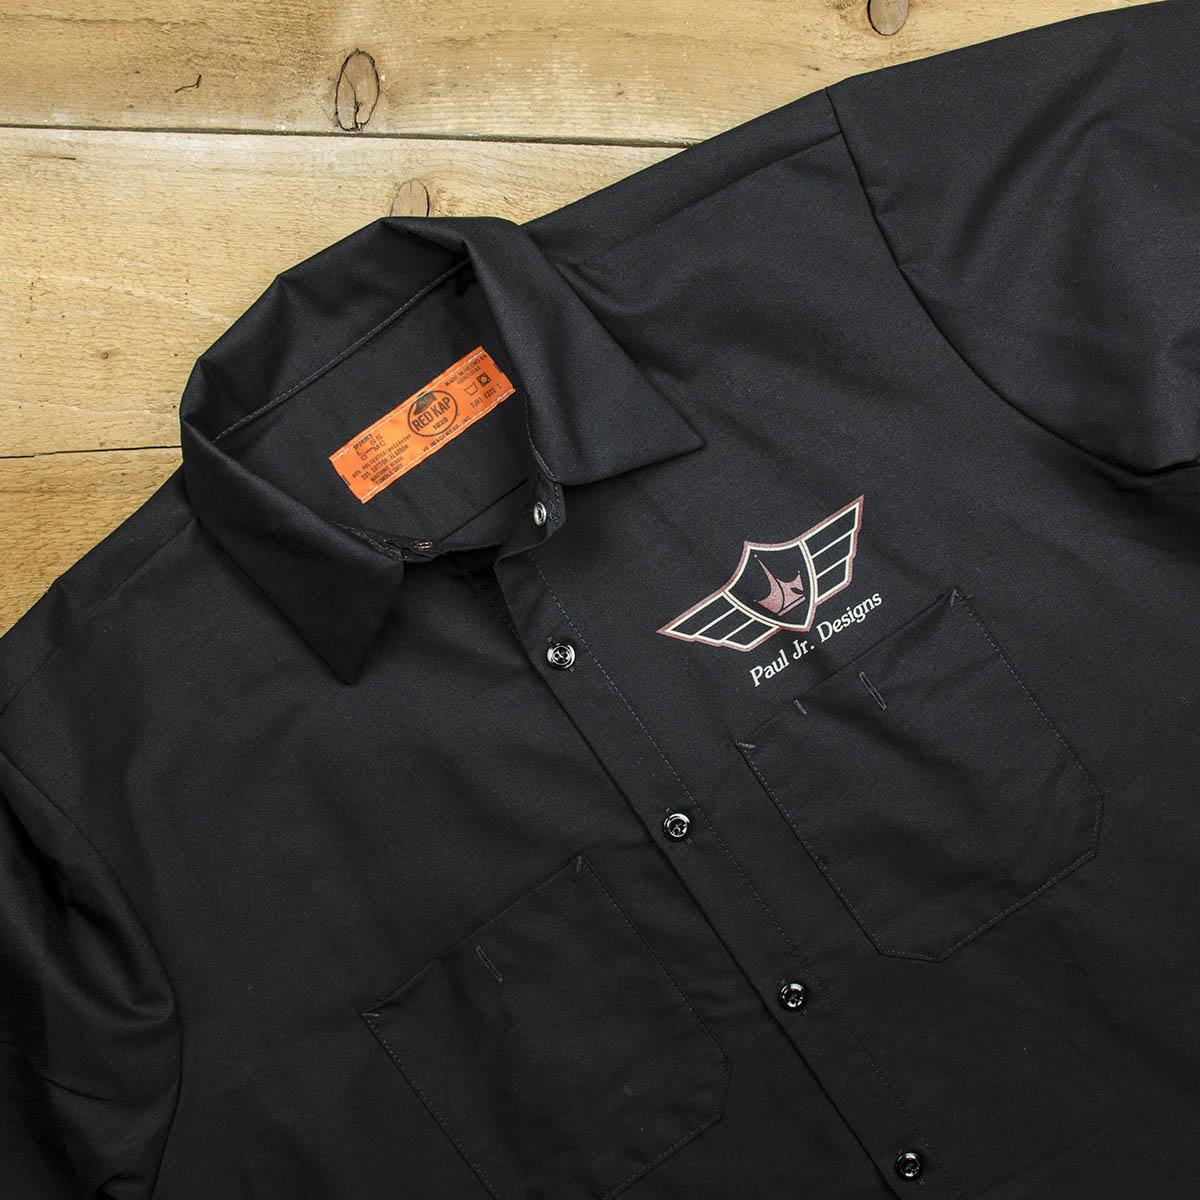 Retro Work Shirt Paul Jr Designs